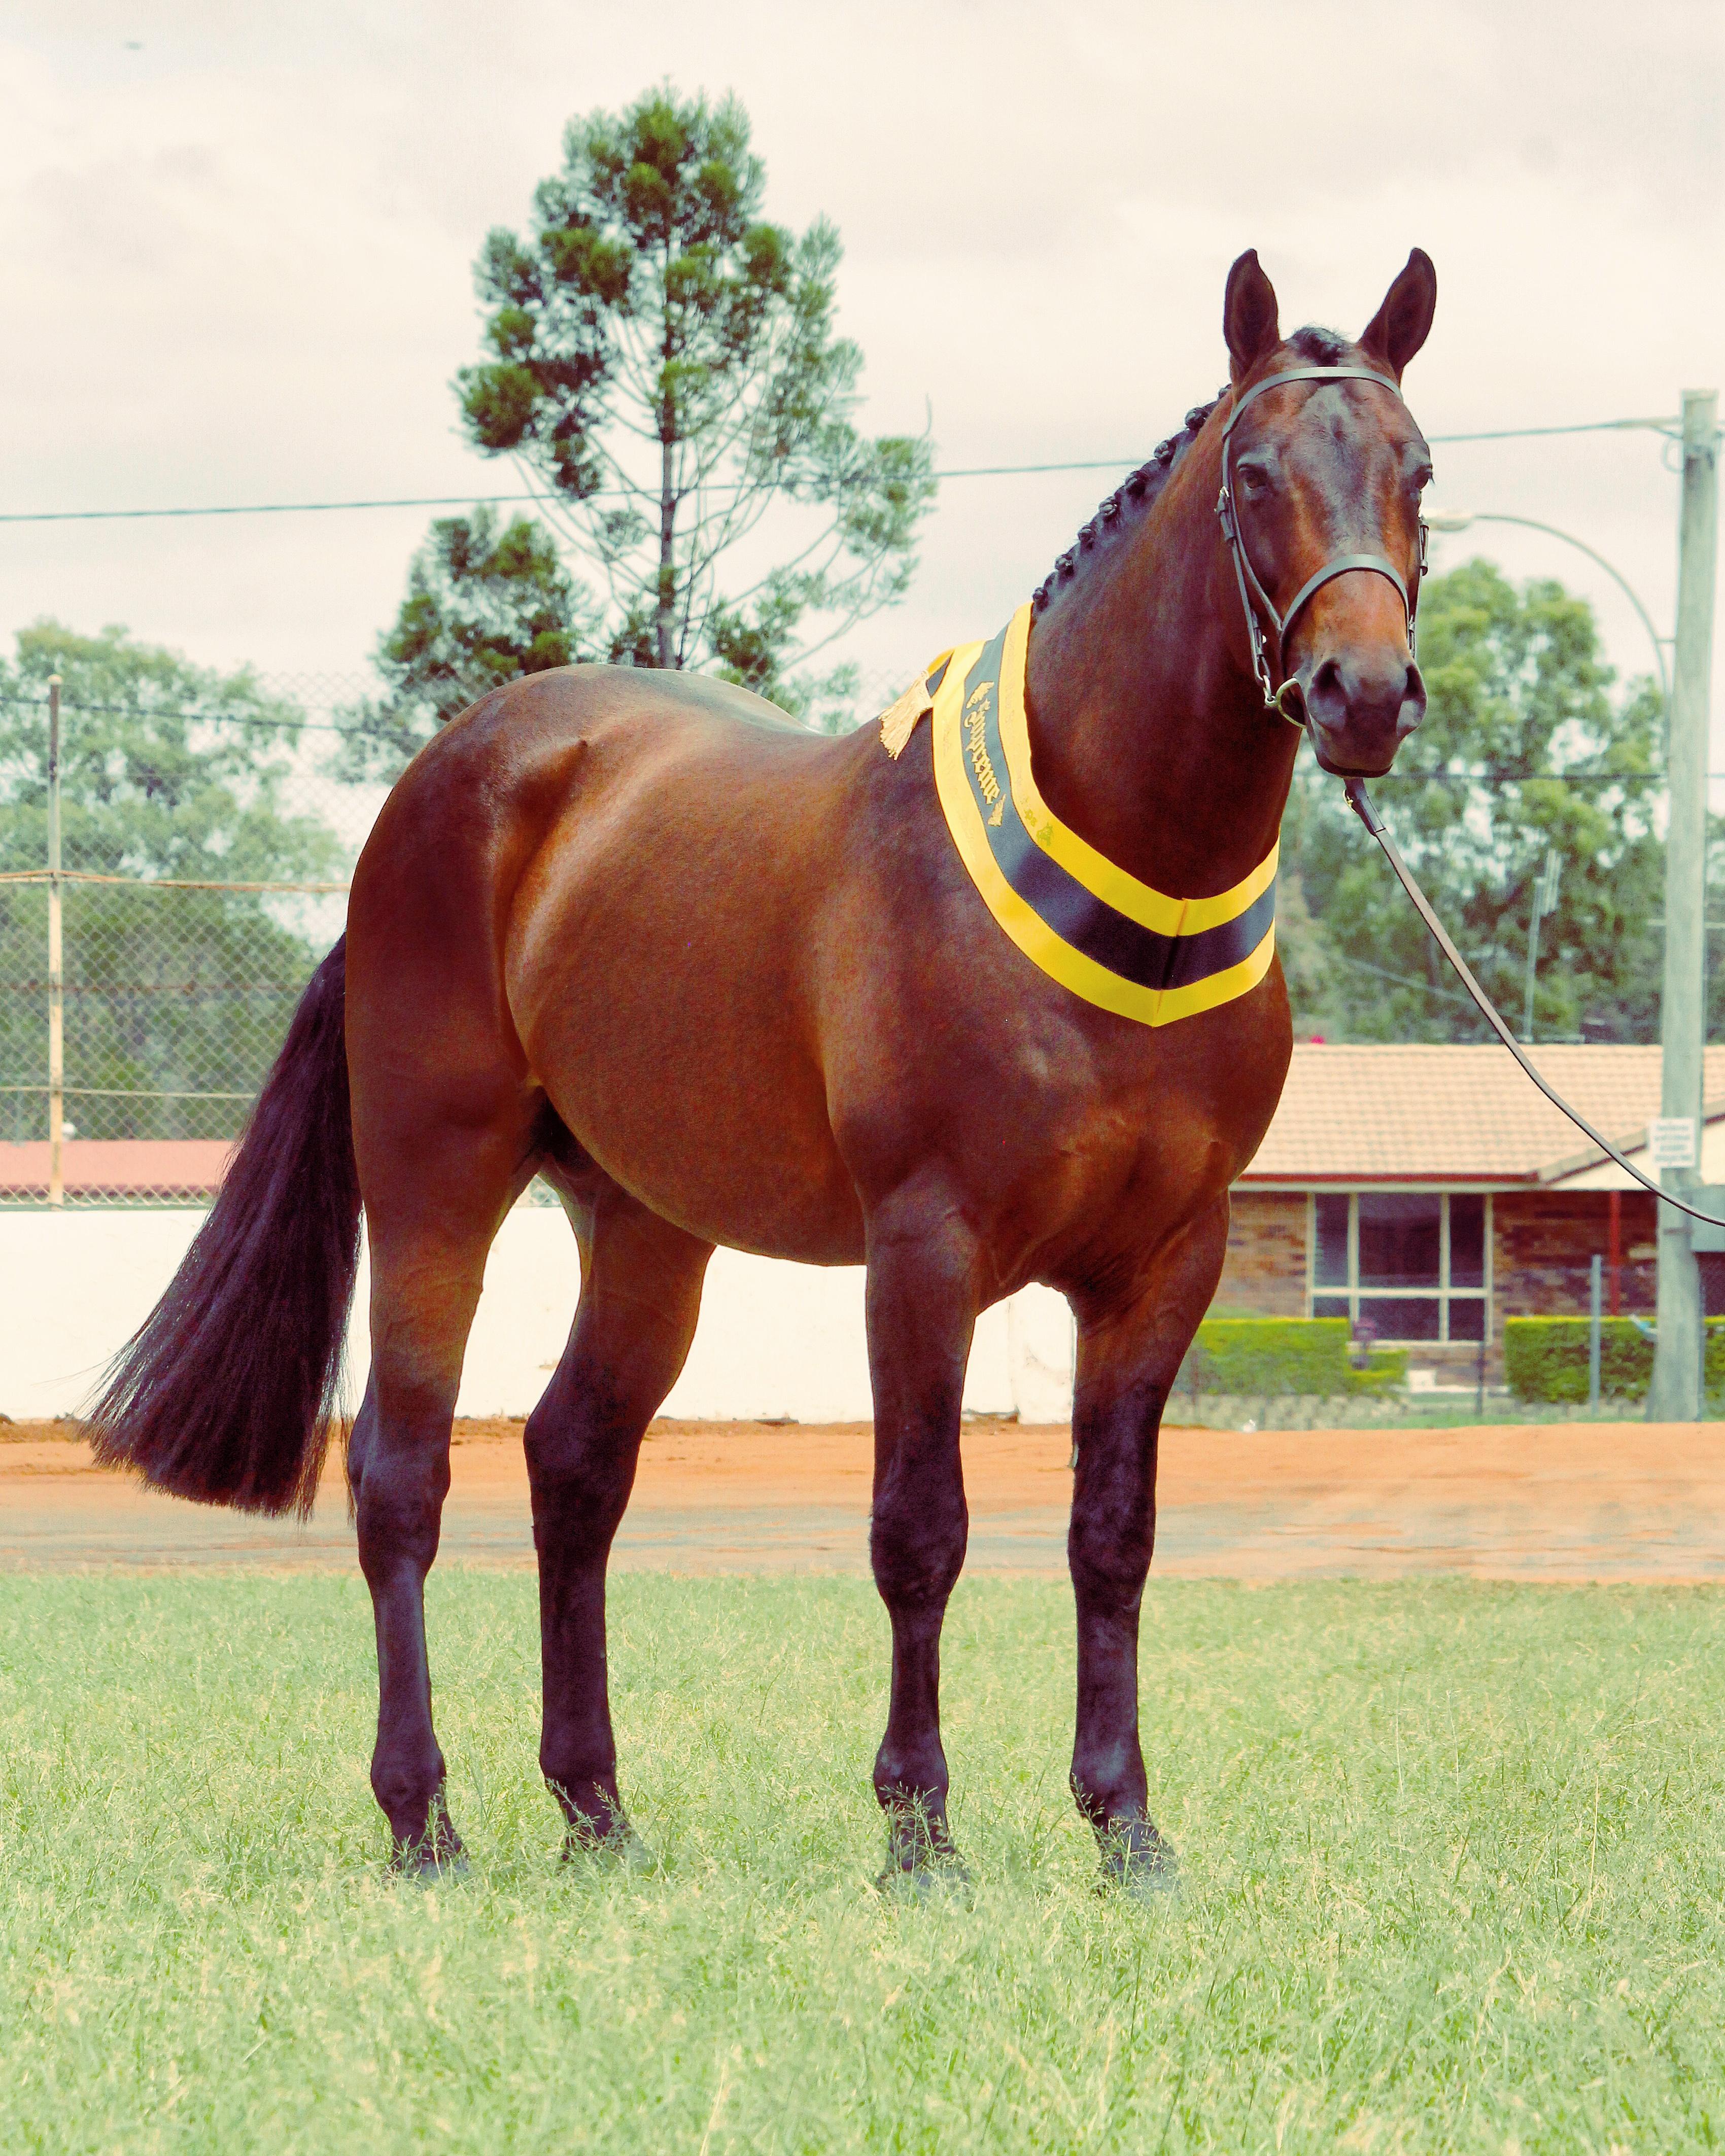 Trublu Trail Blazer, Waler colt at the Waler Championships 2017